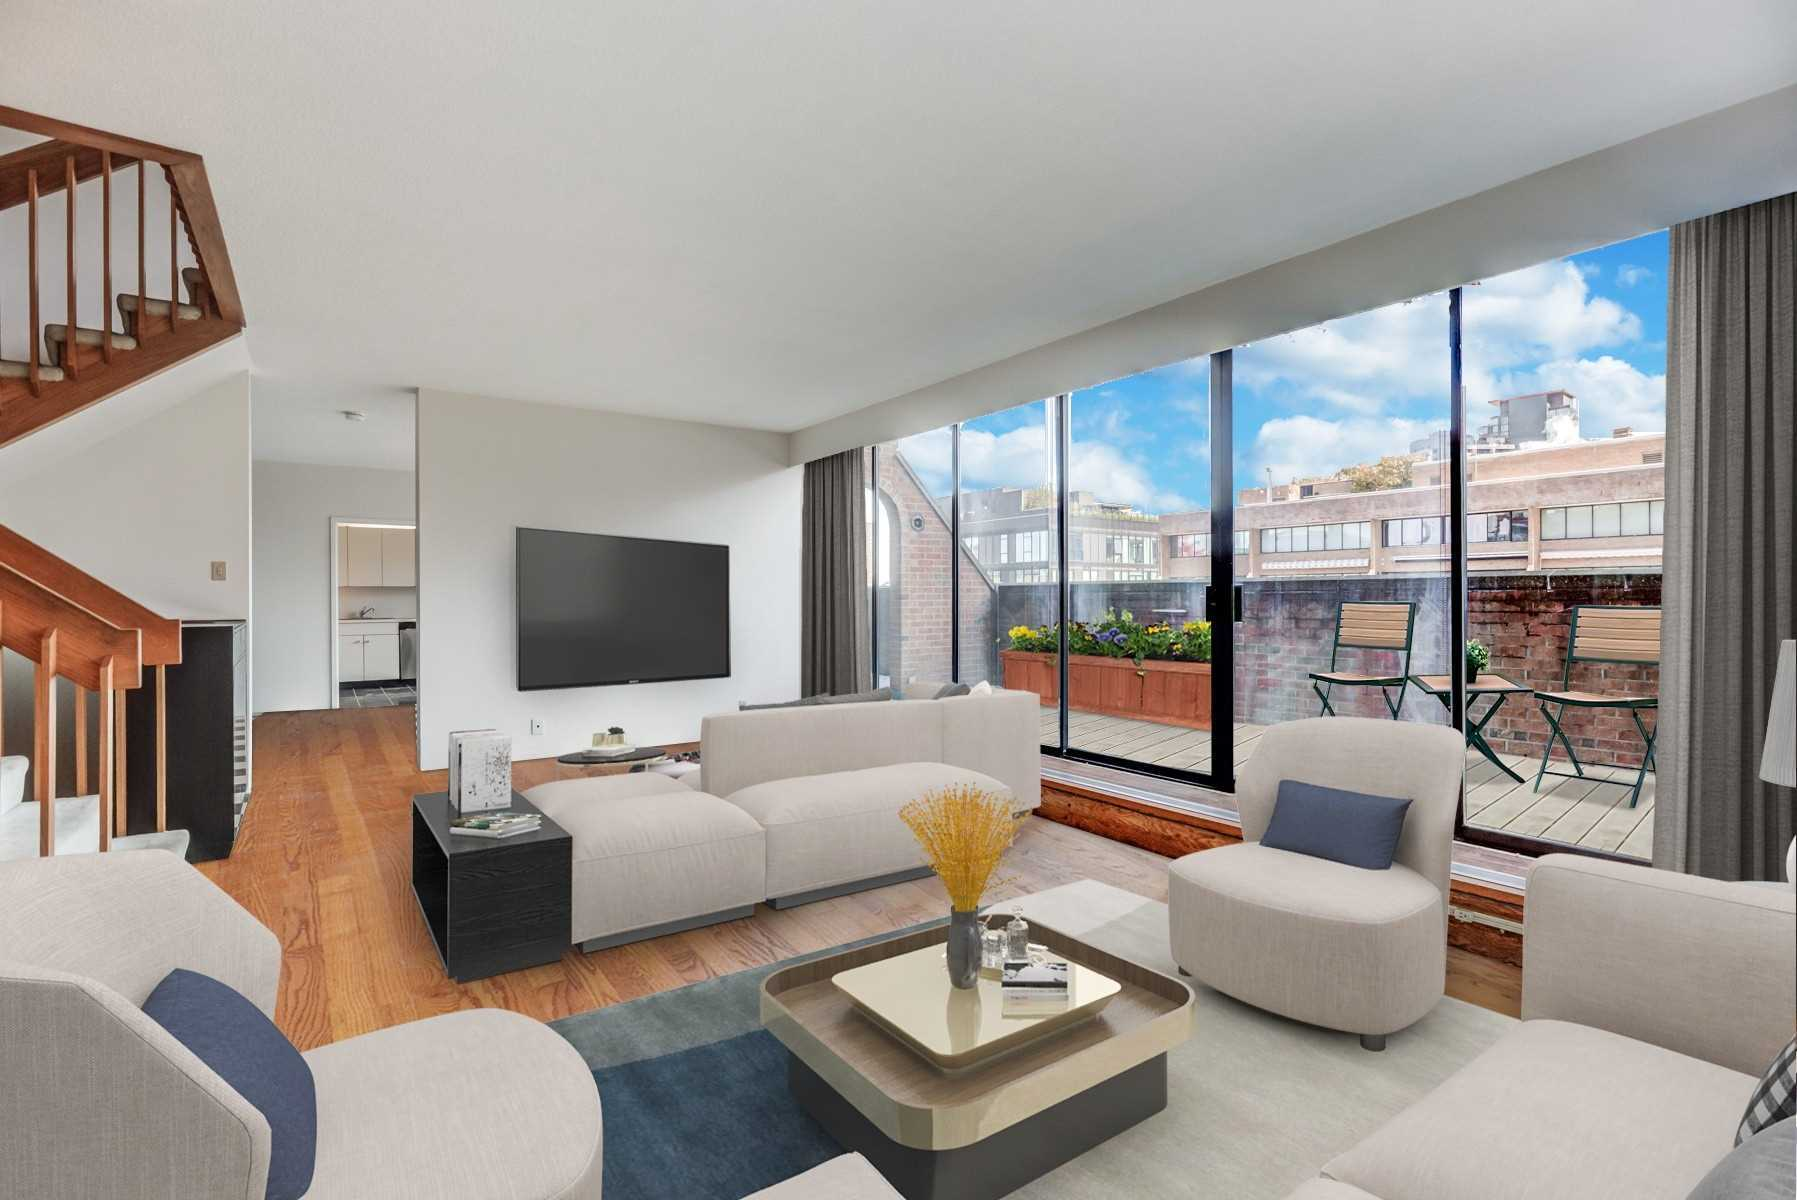 607 - 55A Avenue Rd - Annex Condo Apt for sale, 2 Bedrooms (C5185690) - #1